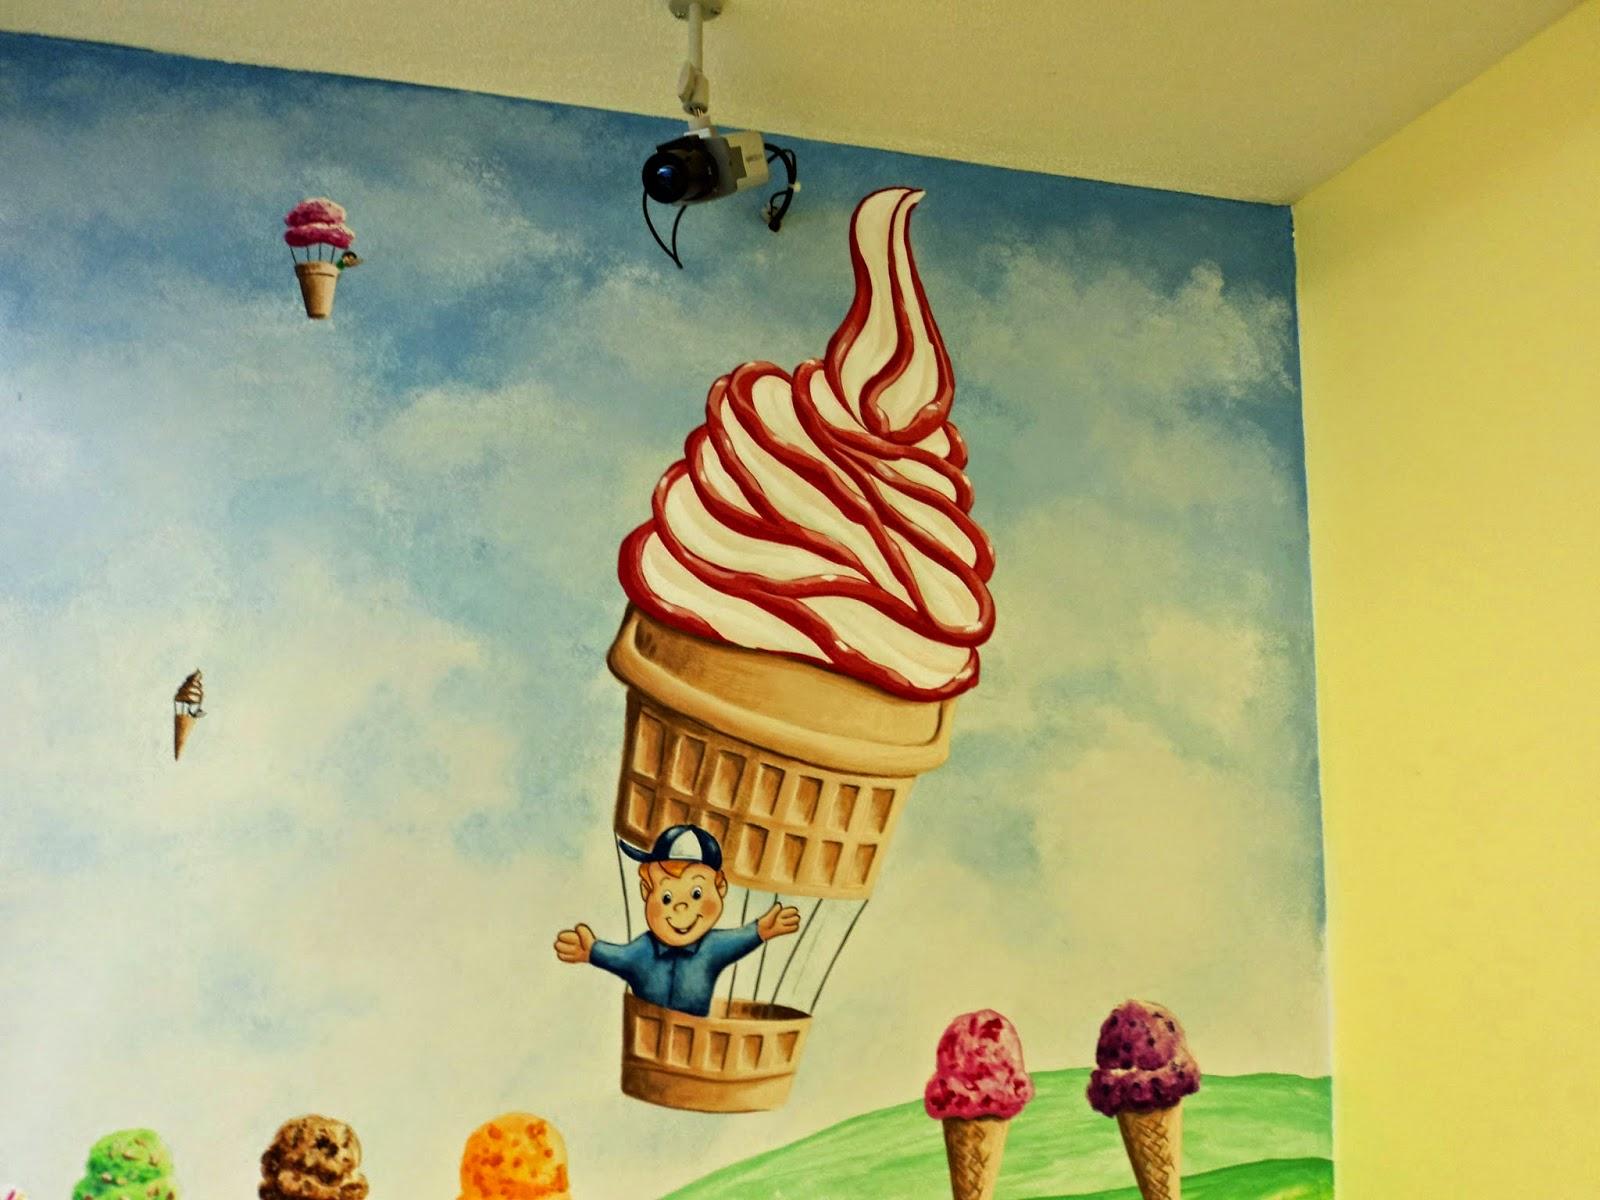 Dennis Day Designs - Lettering, Pinstriping; Murals: Wall Murals